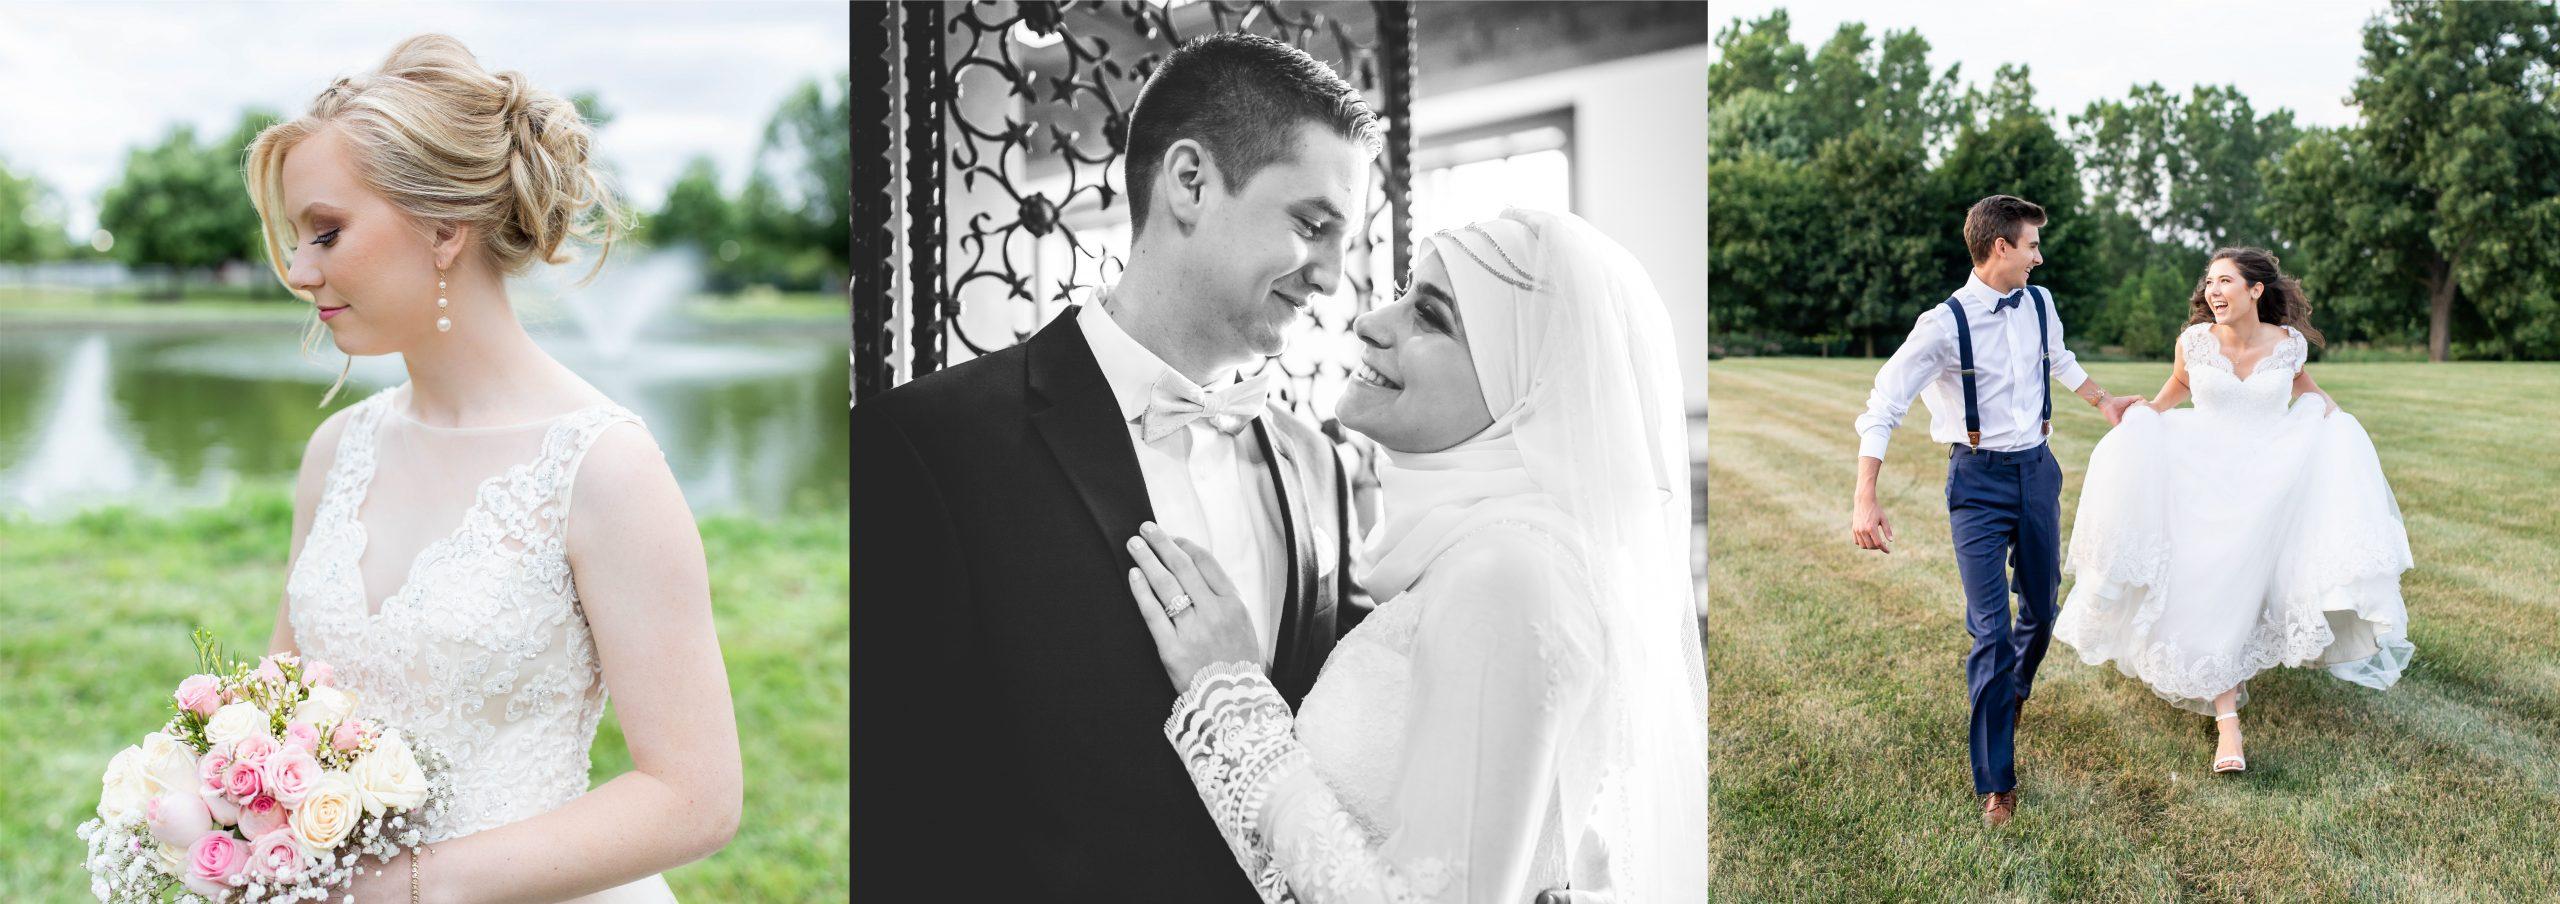 kandra-lynn-photography-michigan-wedding-photographer-15